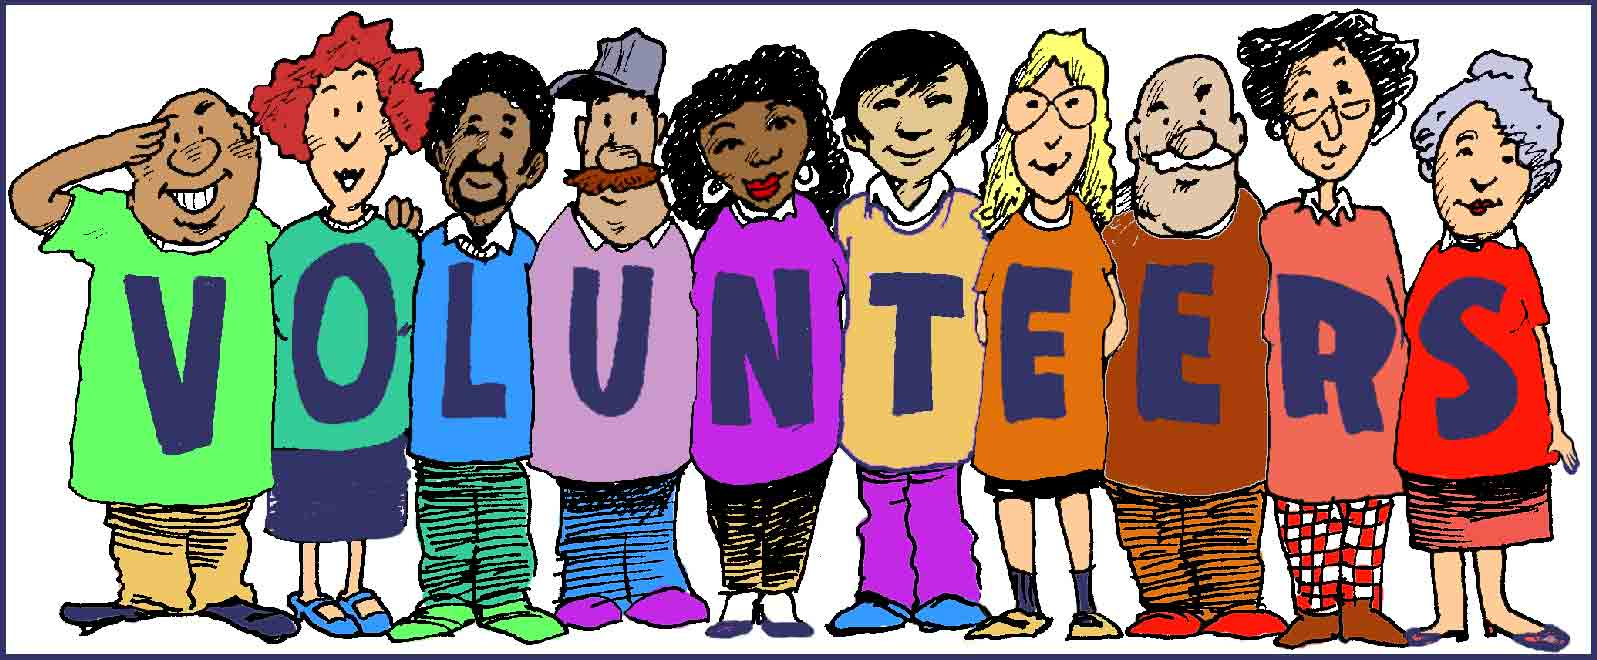 Call for volunteers surrey. Attention clipart volunteer